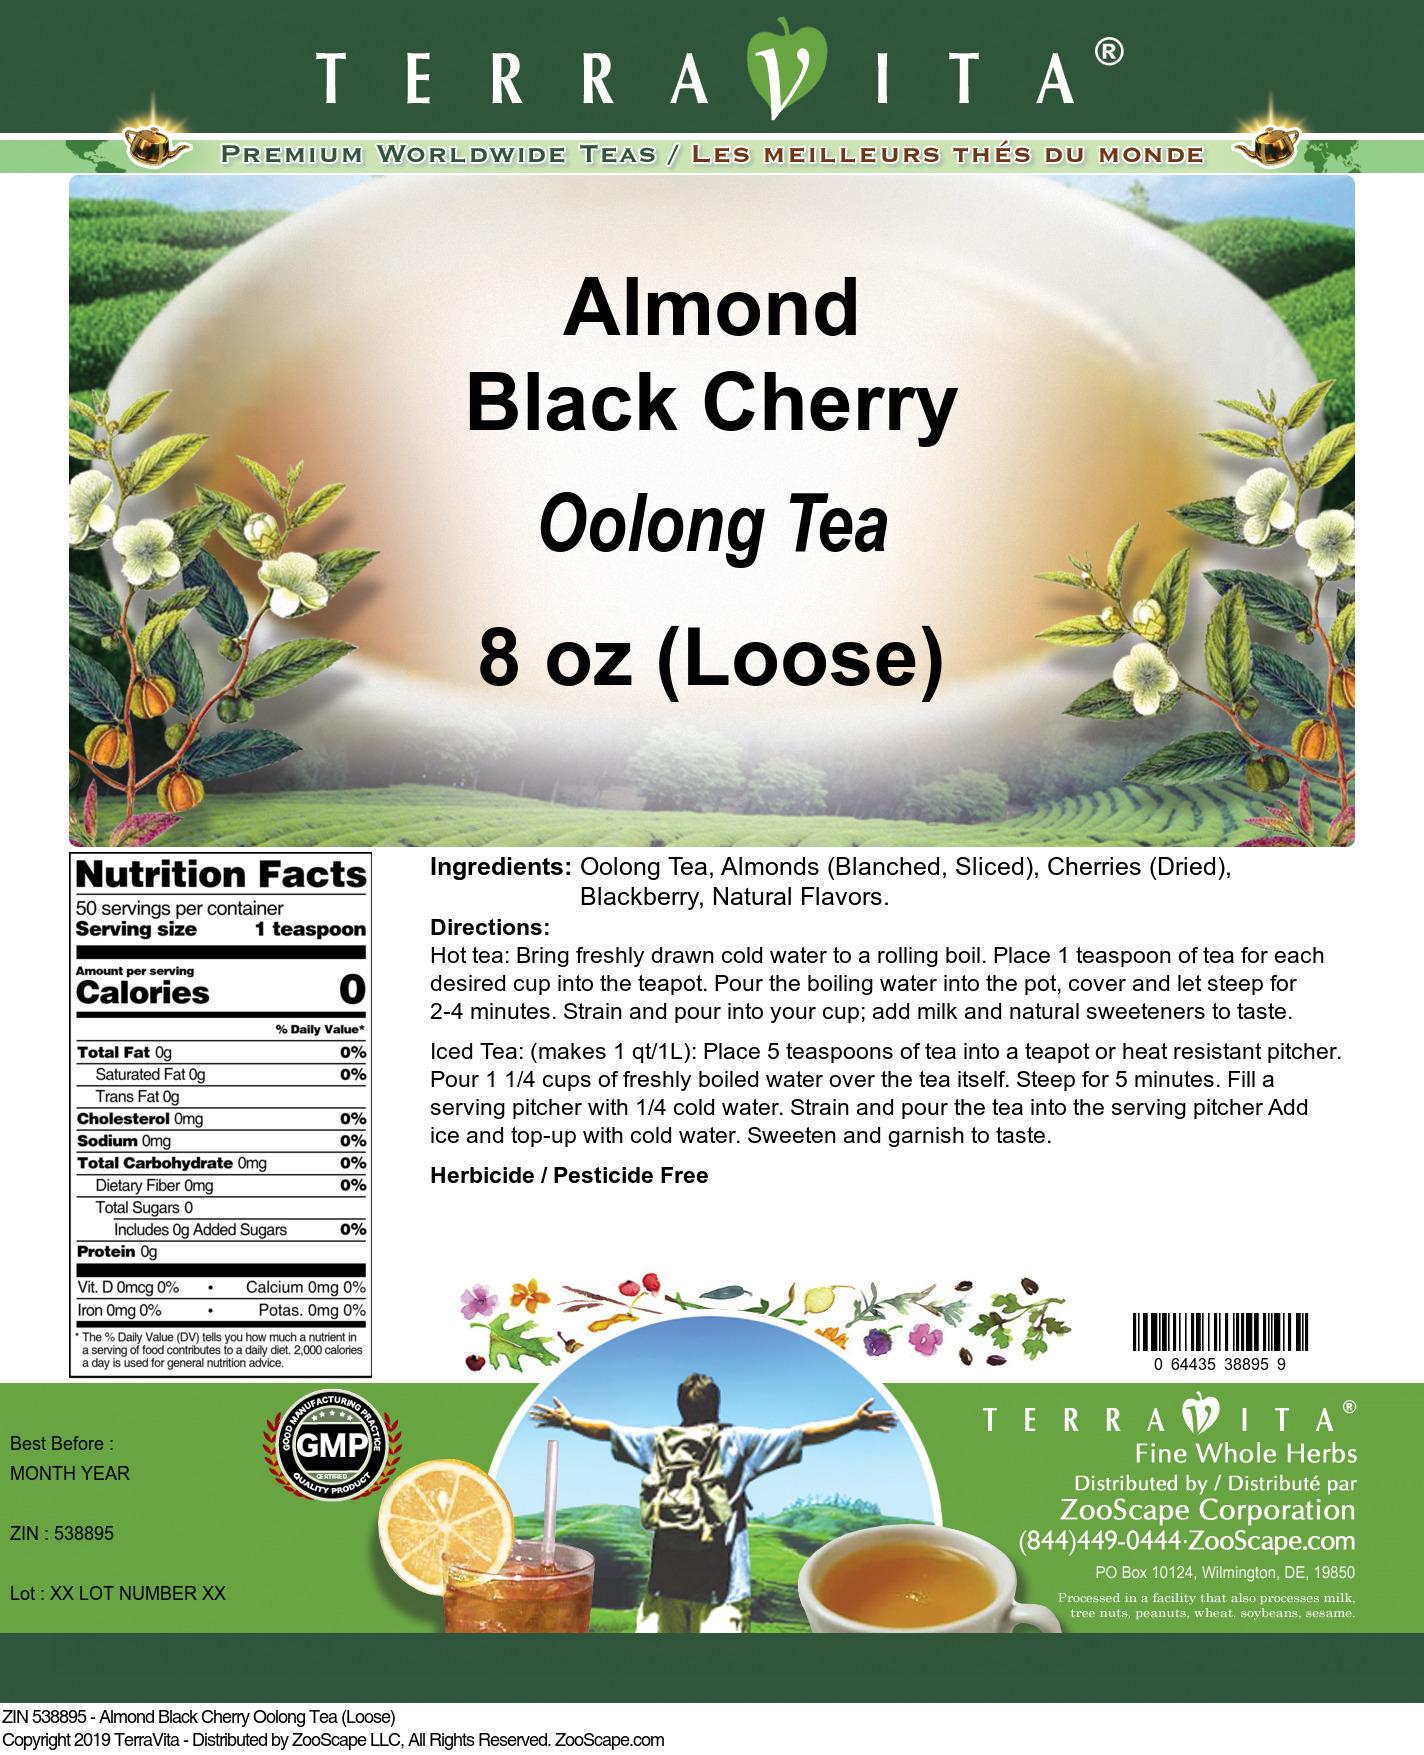 Almond Black Cherry Oolong Tea (Loose)